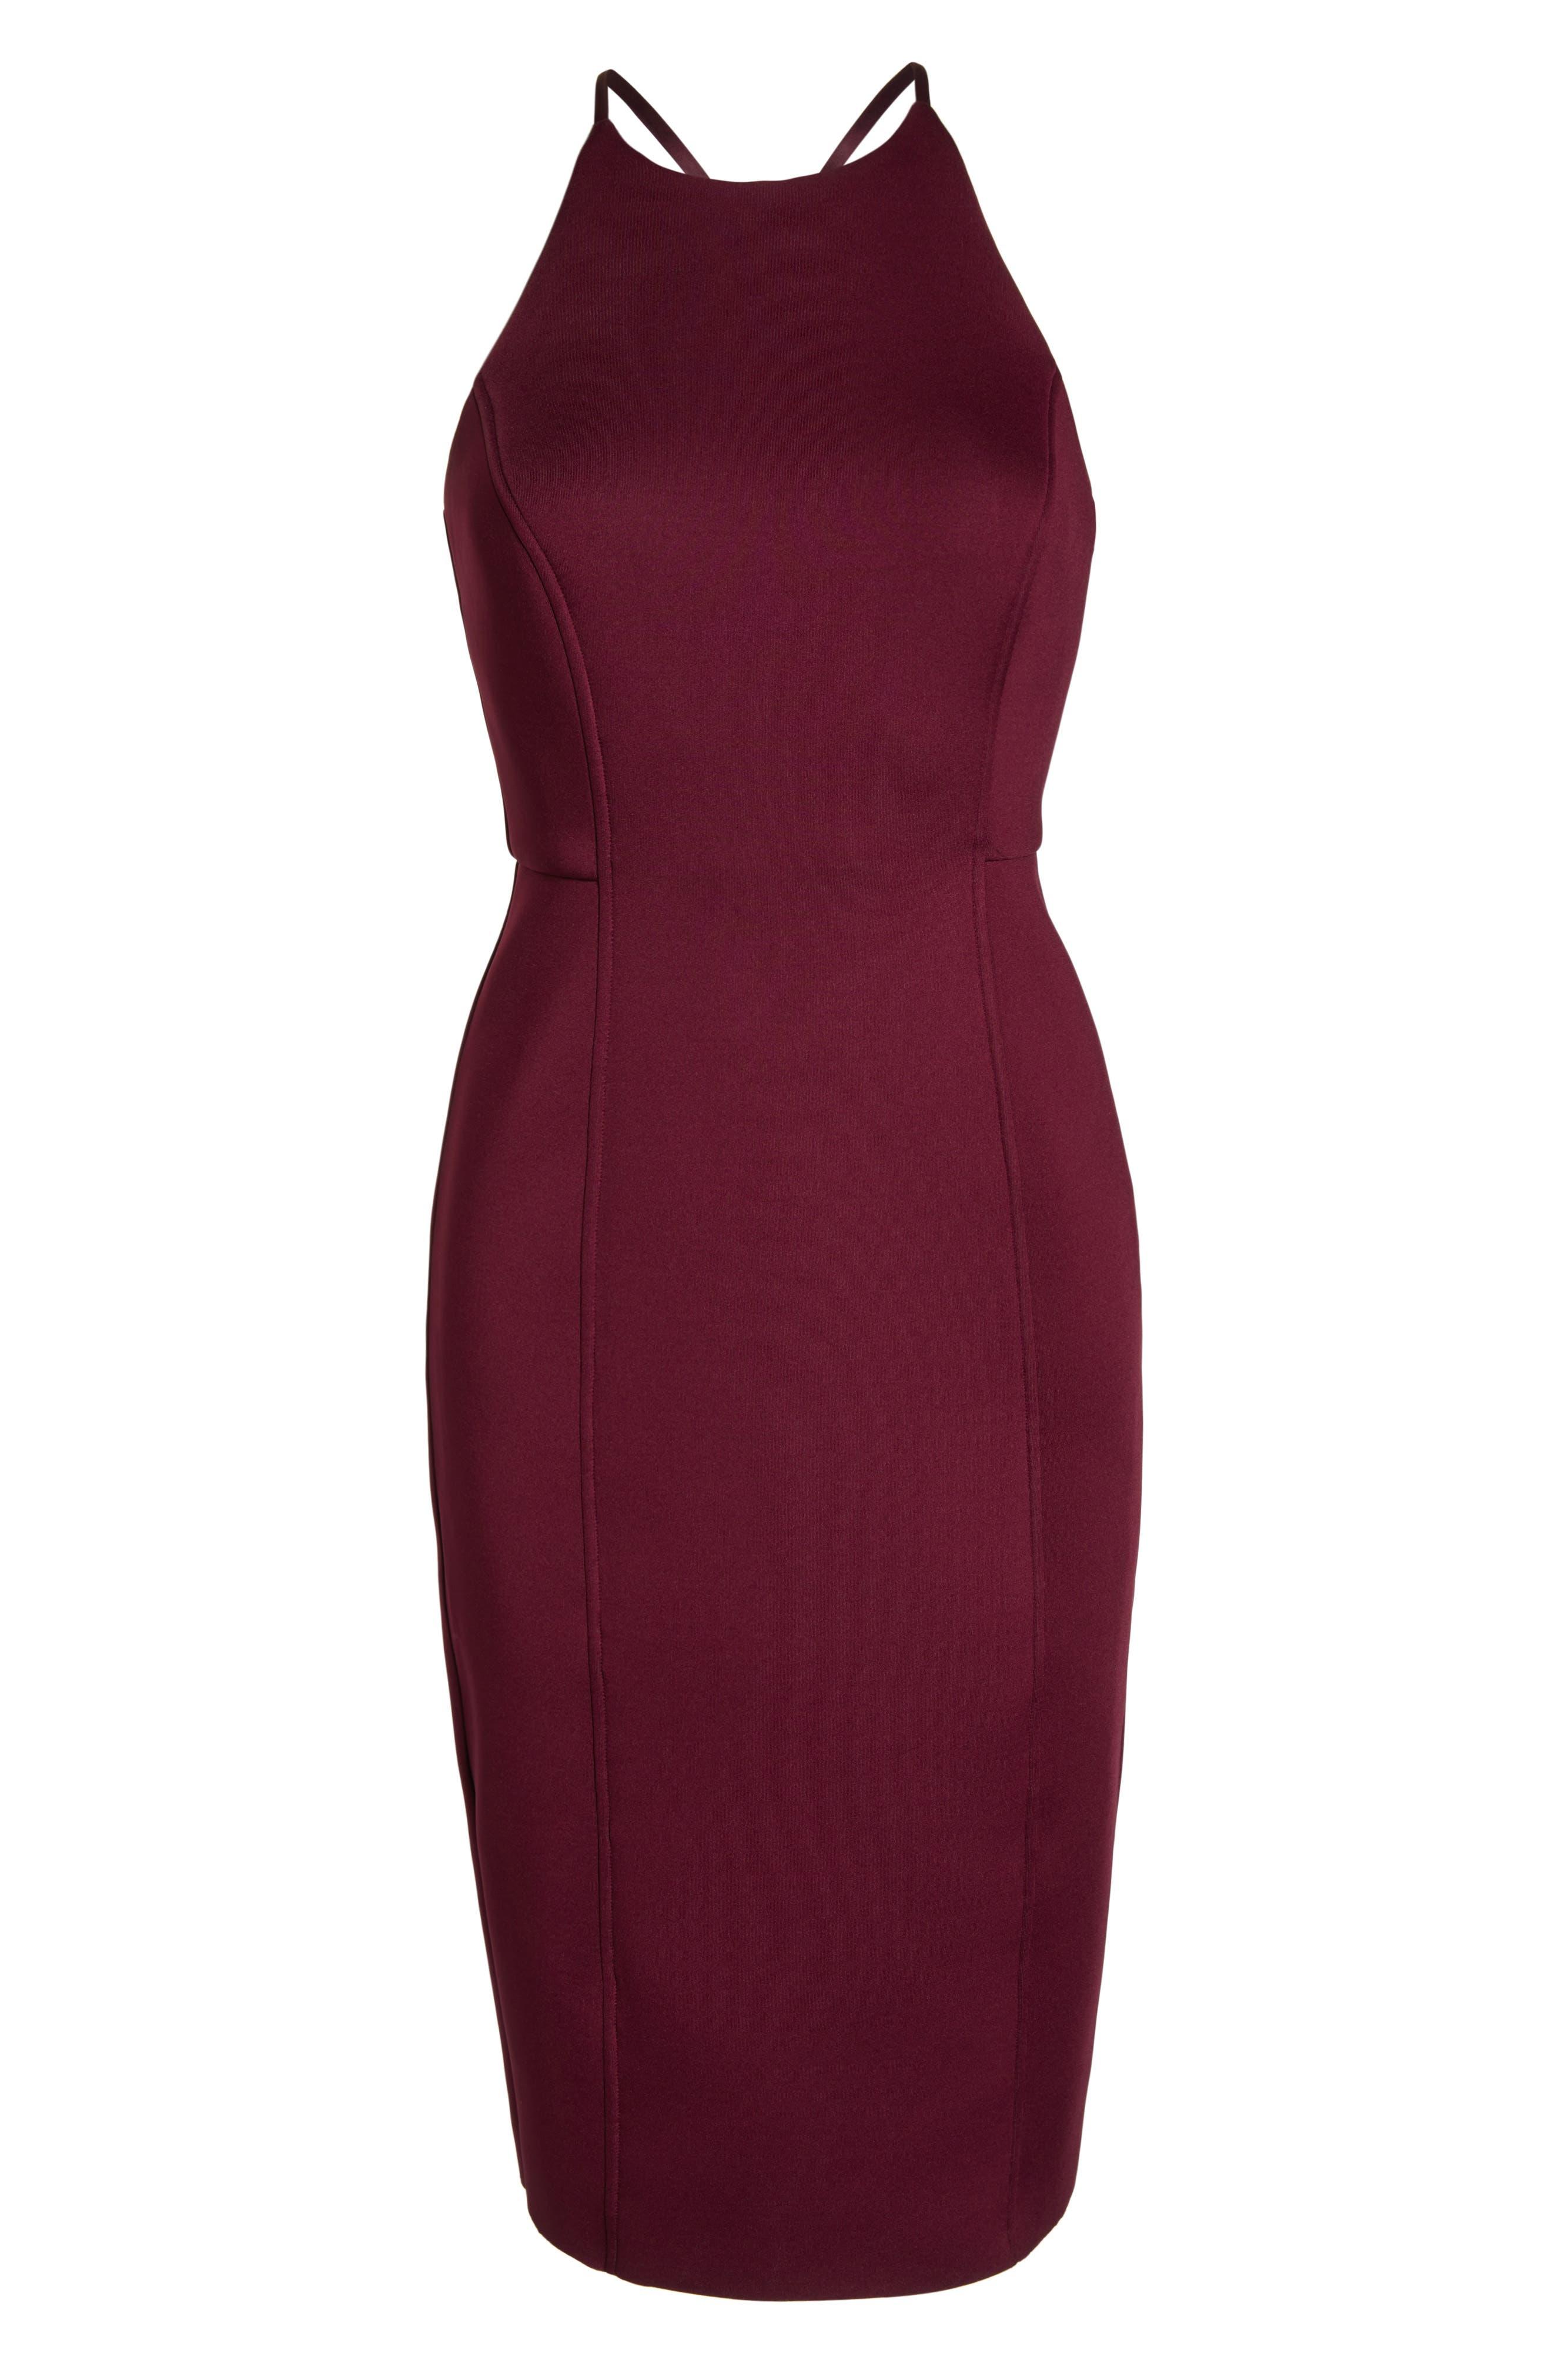 CHELSEA28,                             Scuba Sheath Dress,                             Alternate thumbnail 7, color,                             BURGUNDY